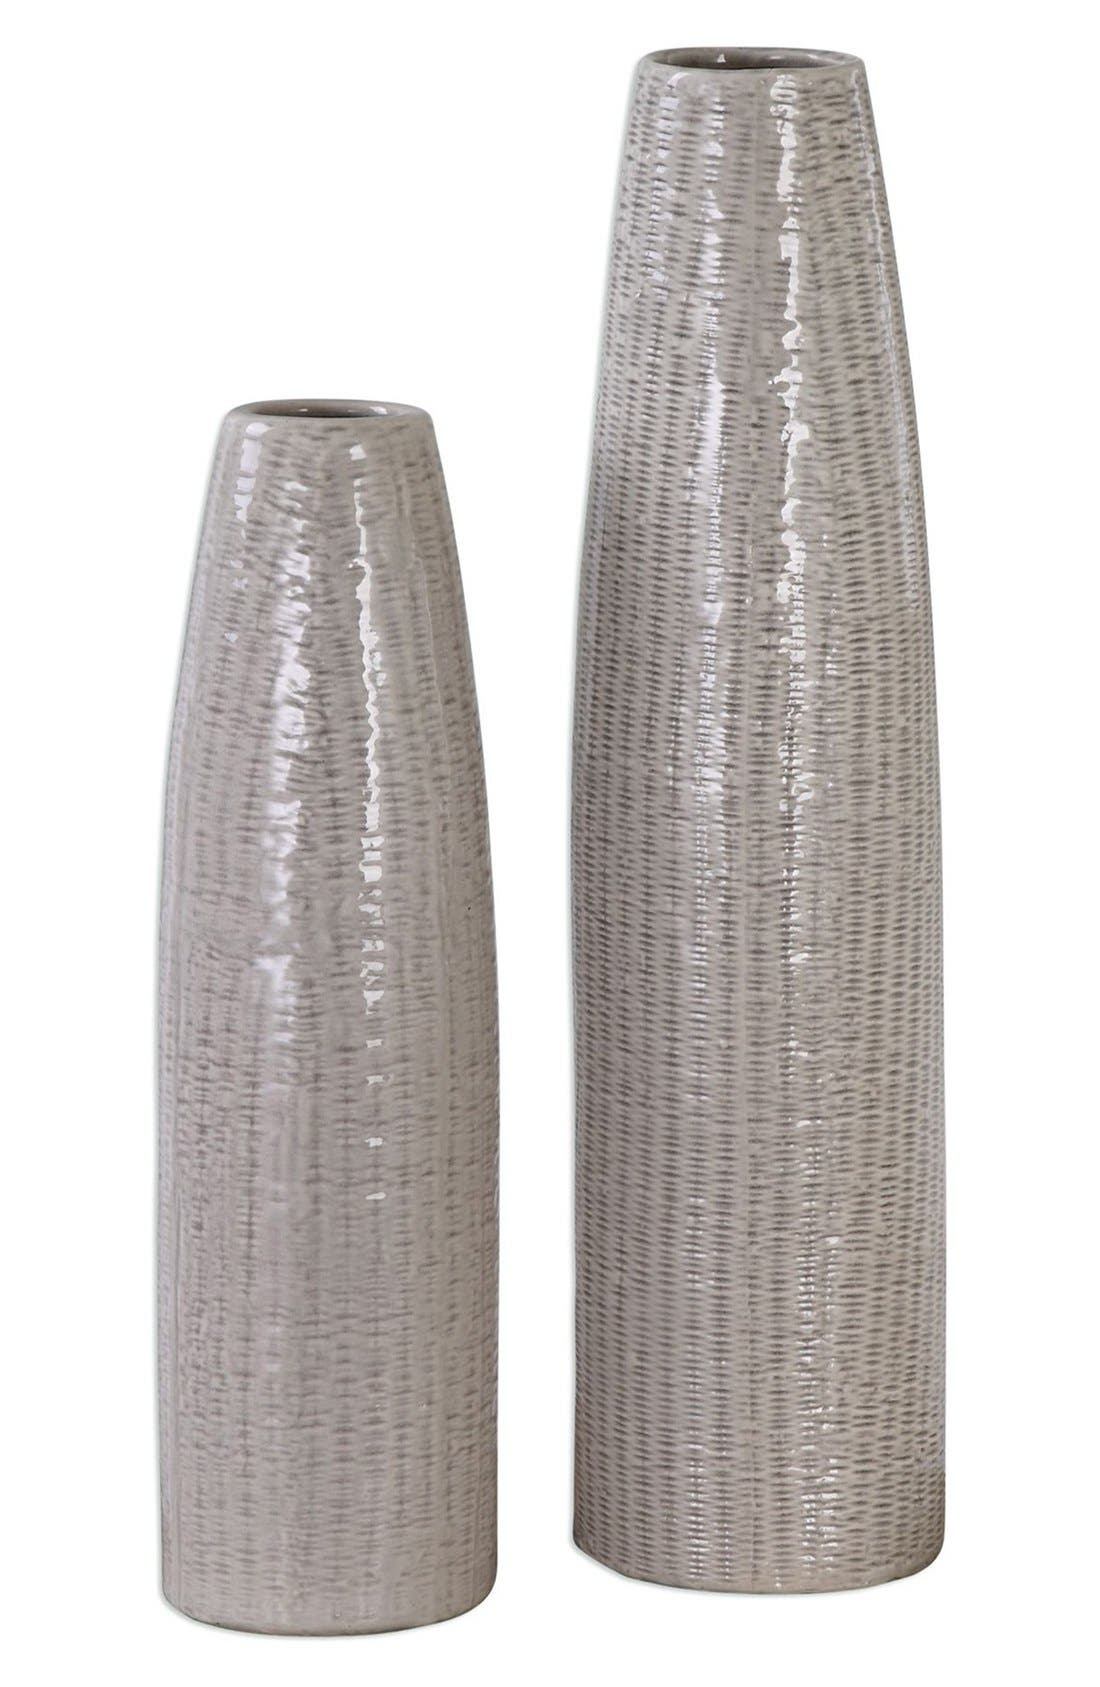 Main Image - Uttermost Textured Ceramic Vases (Set of 2)